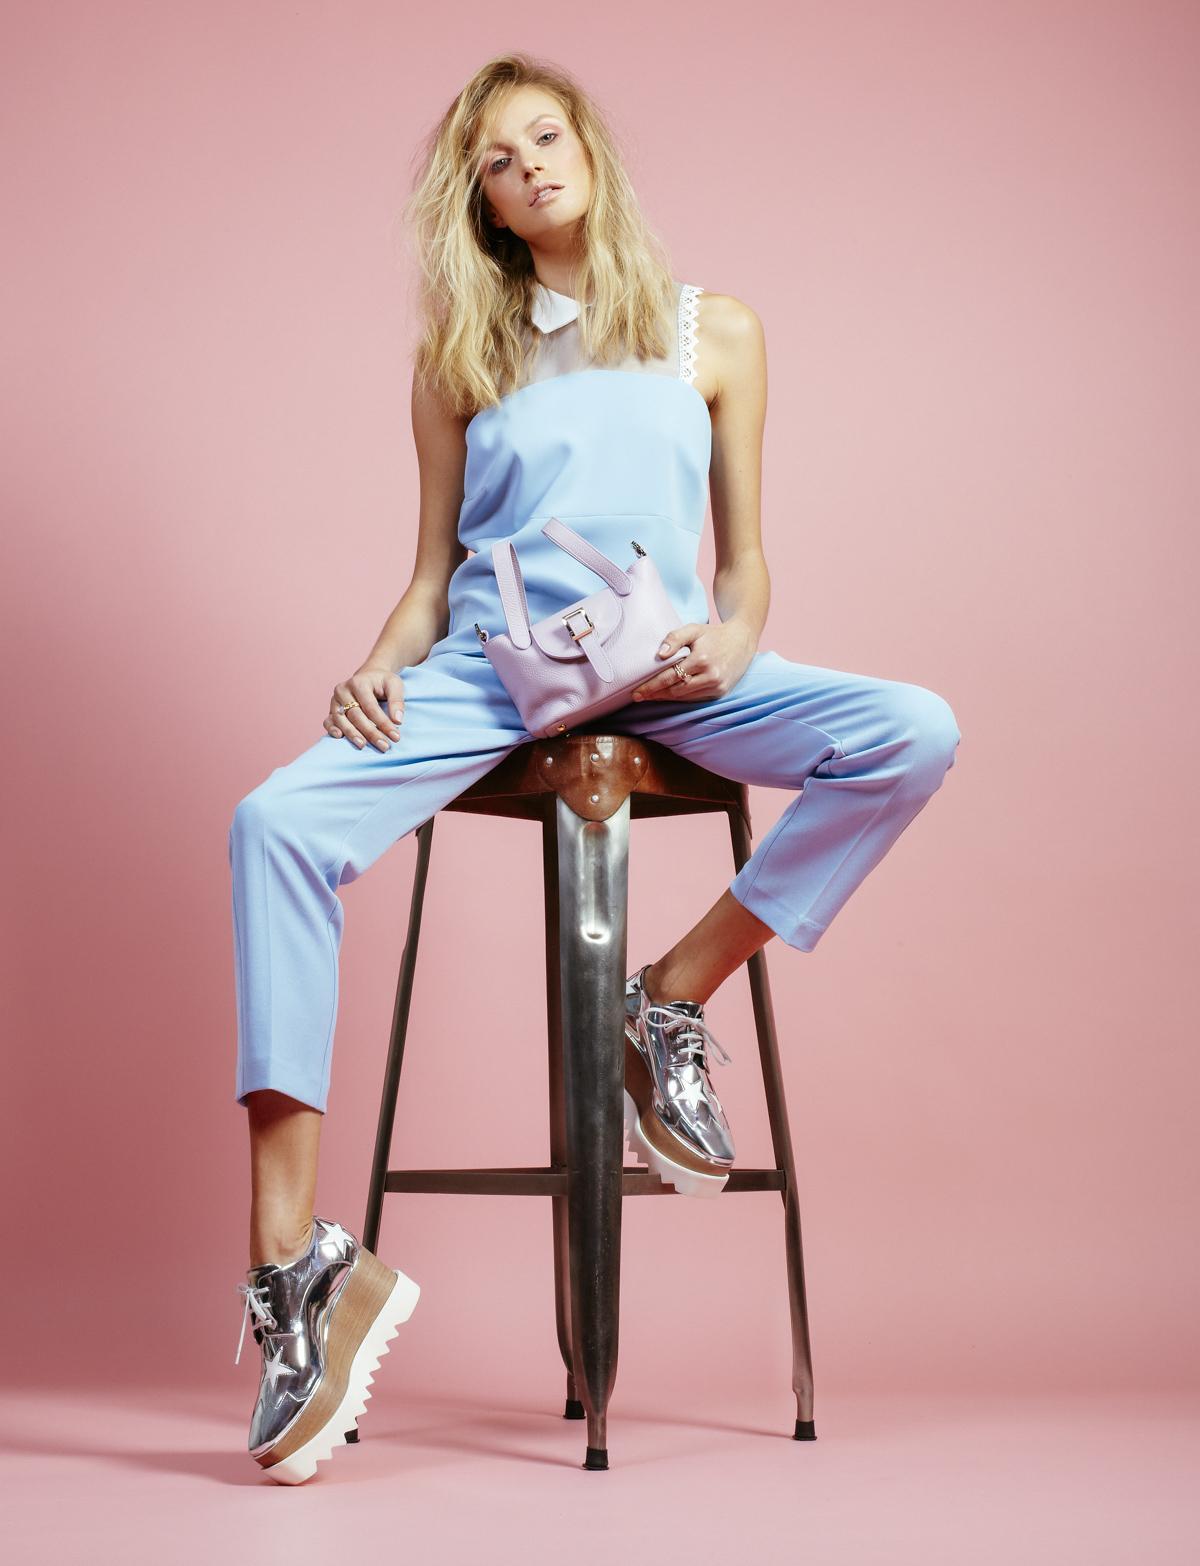 Pinko  top, £155,  Pinko  trousers, £170,  Meli Melo  Micro bag £315,  Stella McCartney  Platforms, £625